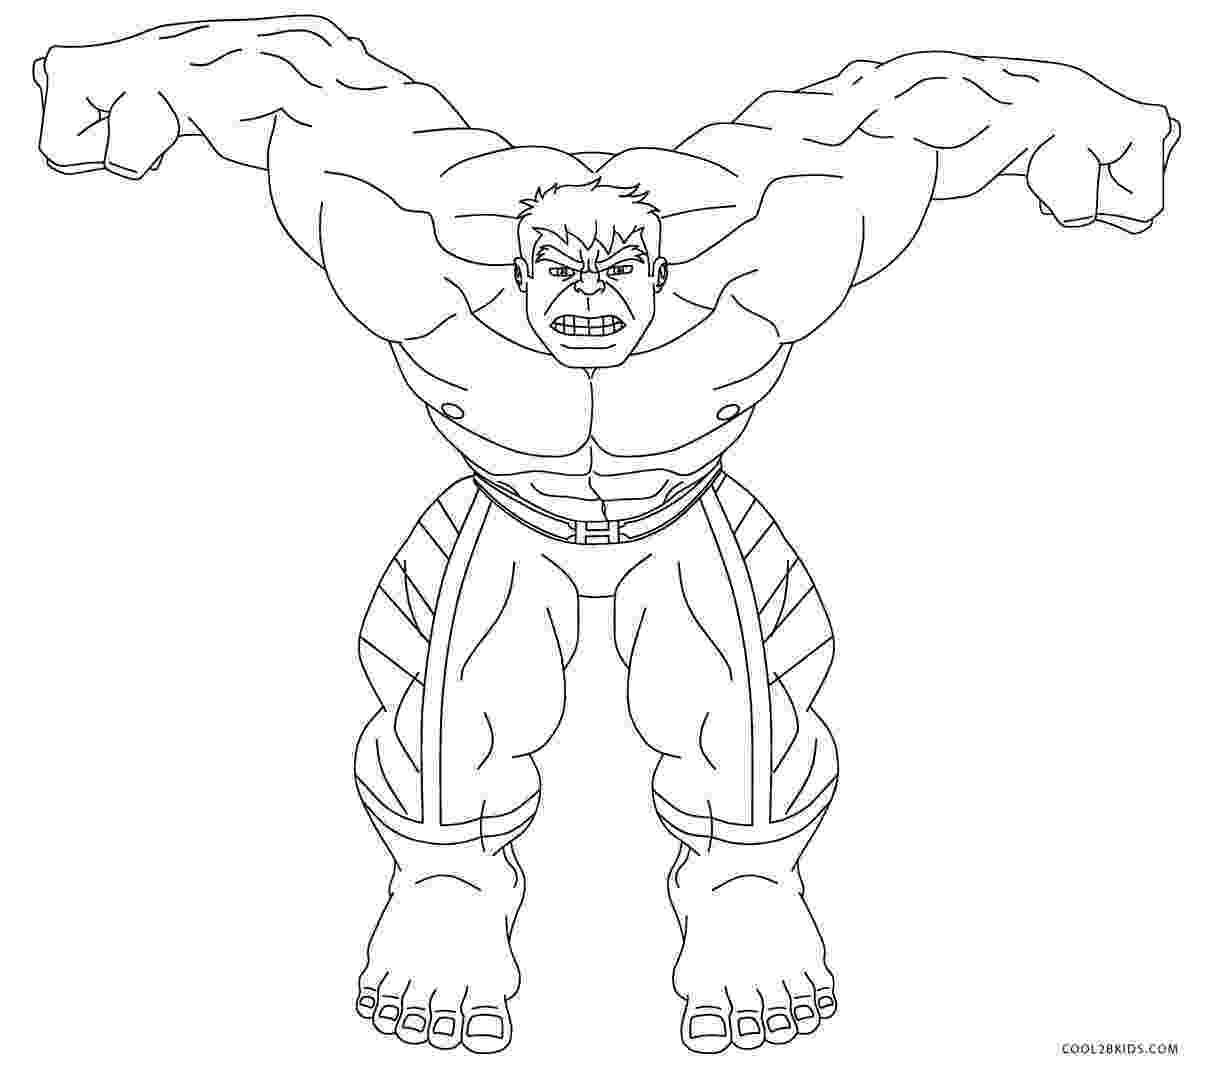 hulk coloring pages to print free hulk drawing pages at getdrawings free download hulk pages free print coloring to